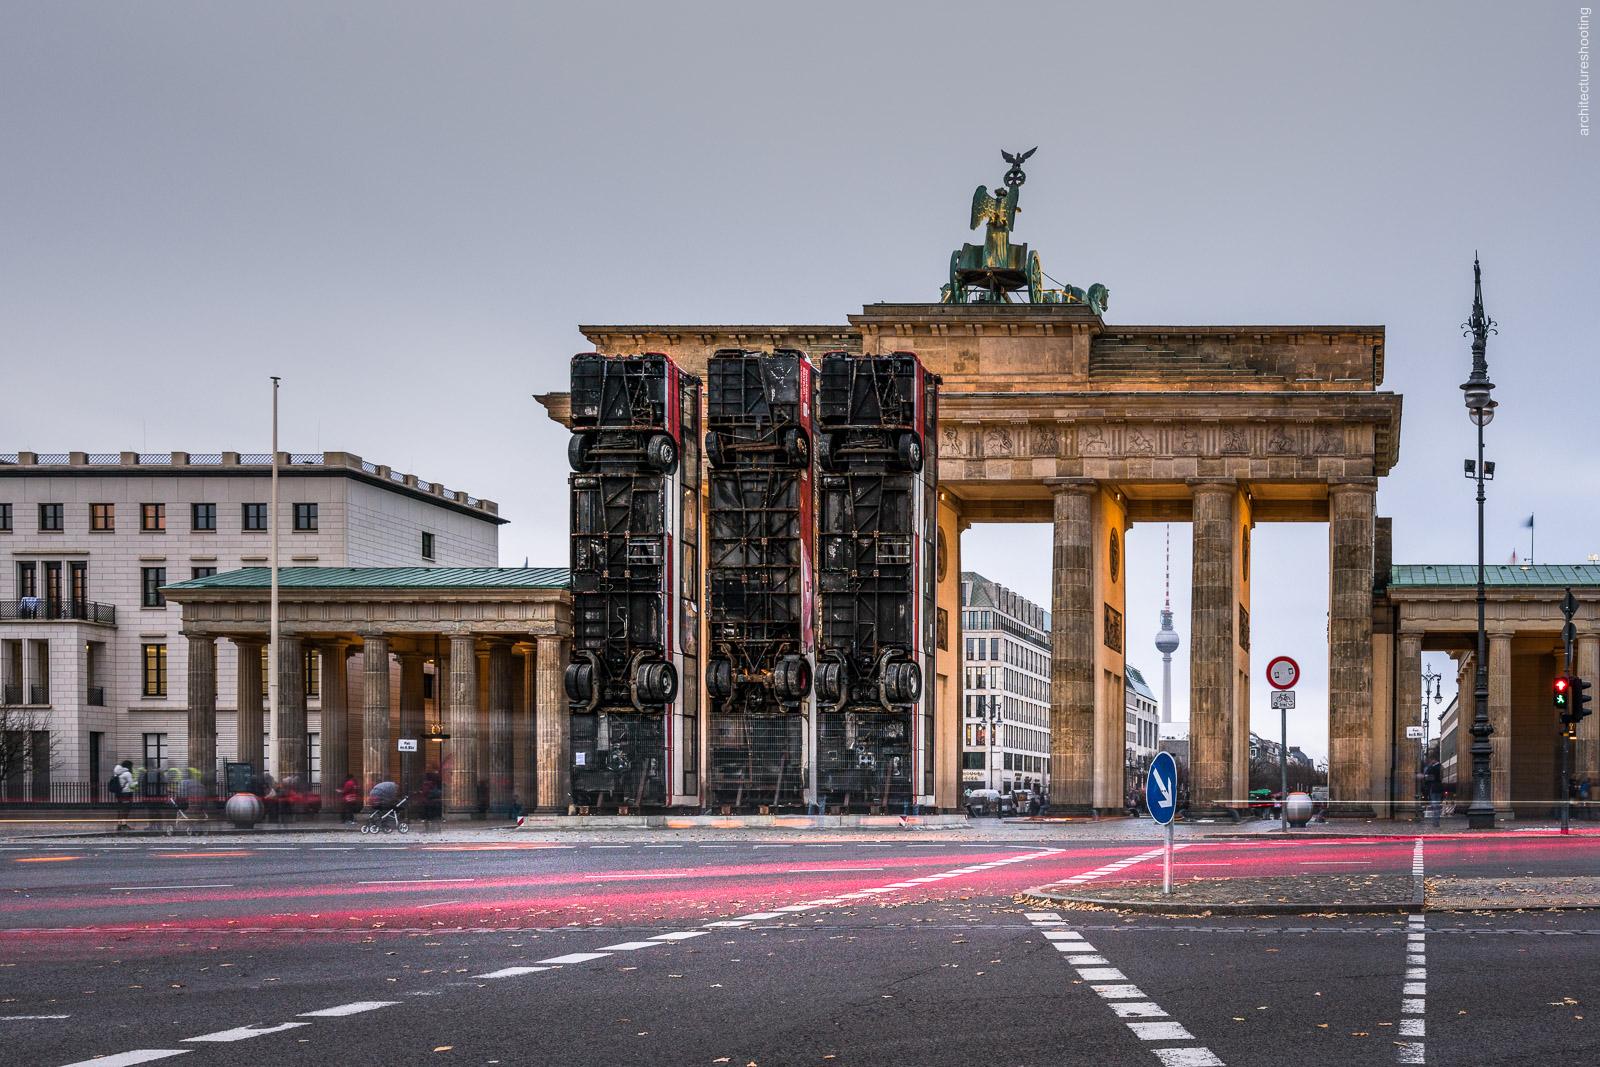 Monument - Brandenburger Tor, Berlin - Manaf Halbouni, November 2017 - Foto: Markus Gröteke / architecureshooting